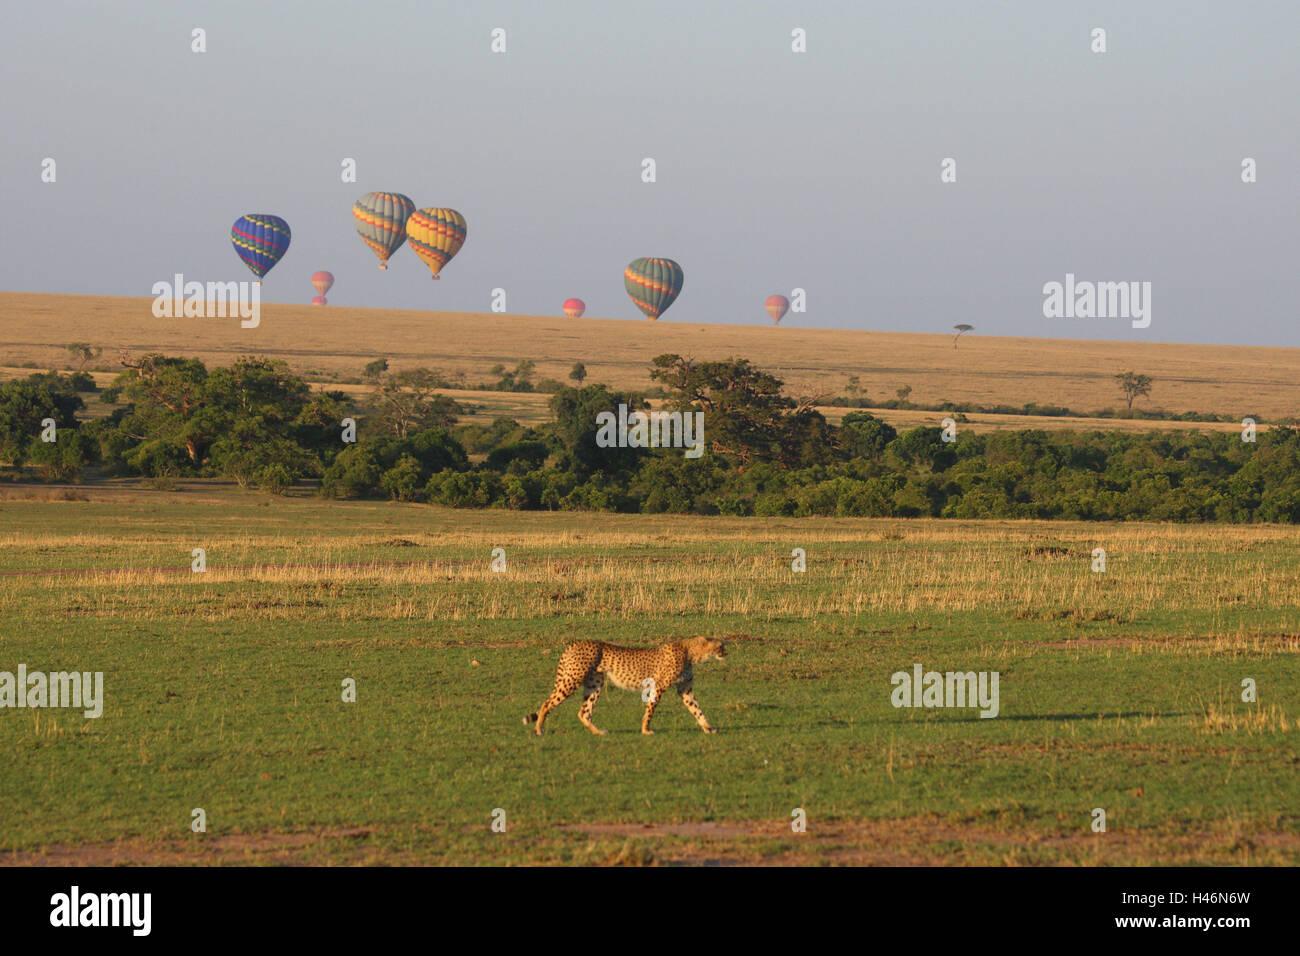 Balloon safari, steppe, cheetah, Masai Mara, Africa, Kenya, - Stock Image